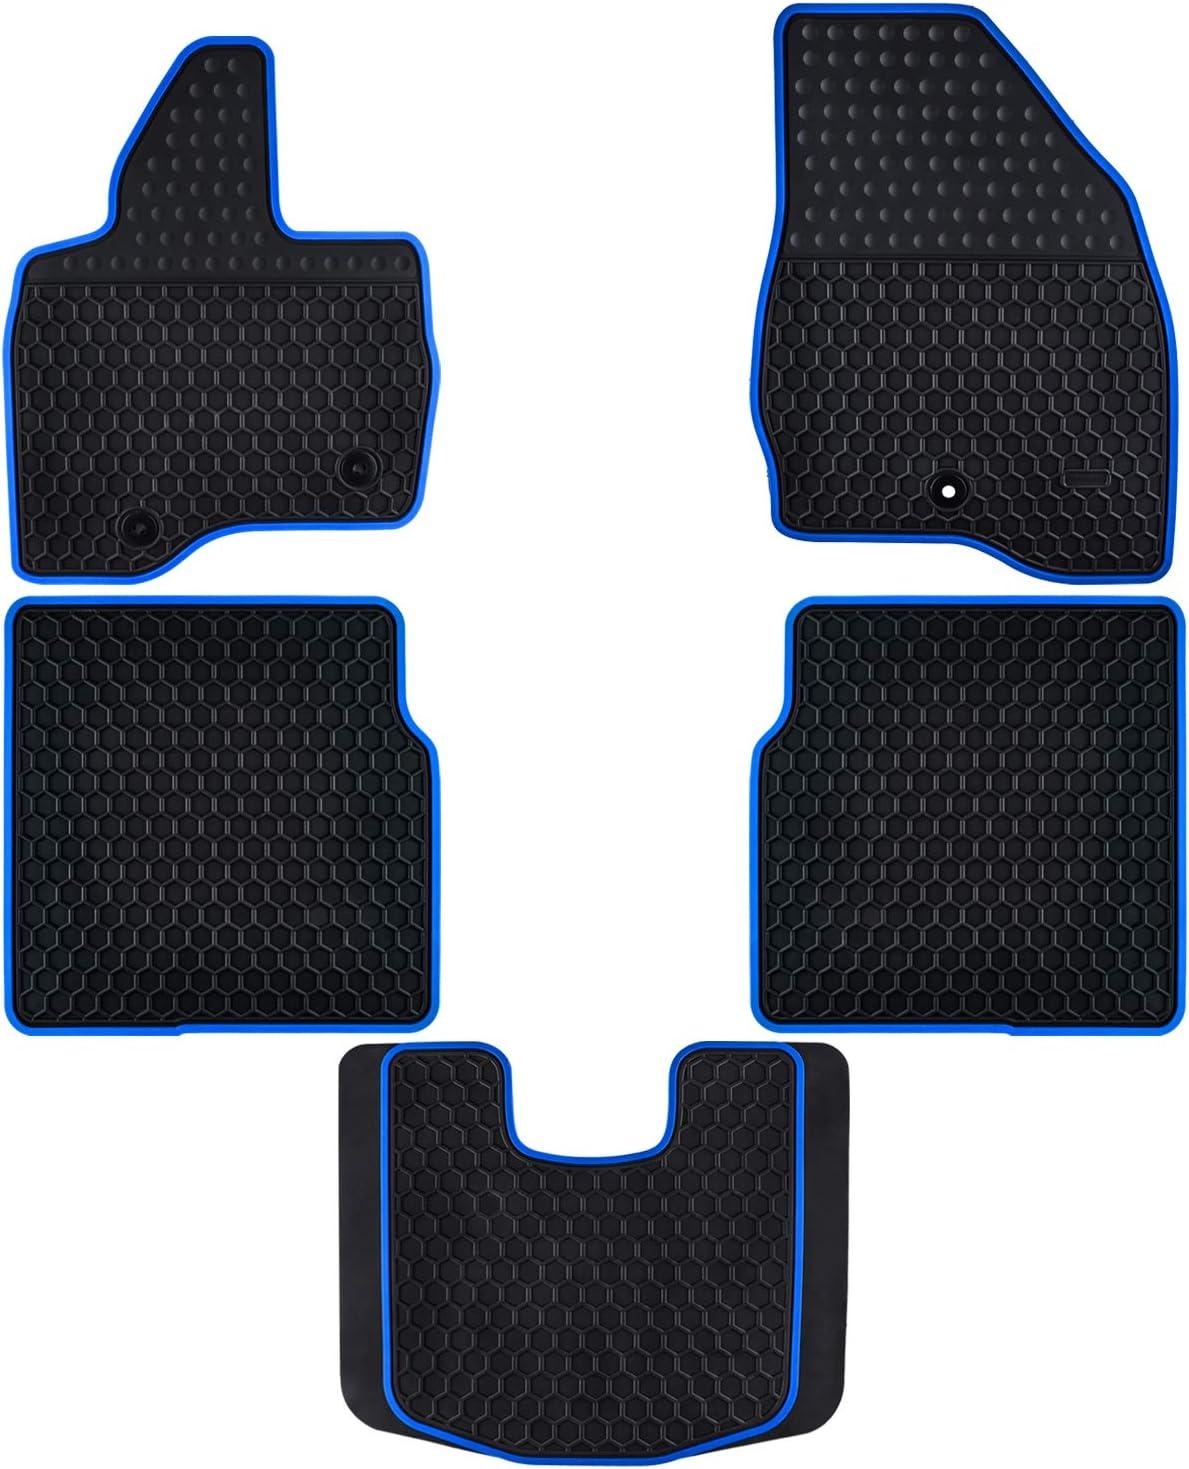 Ucaskin Car Floor Mats Custom Fit for Ford Explorer 2017 2018 2019 Odorless Washable Rubber Foot Carpet Heavy Duty Anti-Slip All Weather Protection Car Floor Liner-Blue